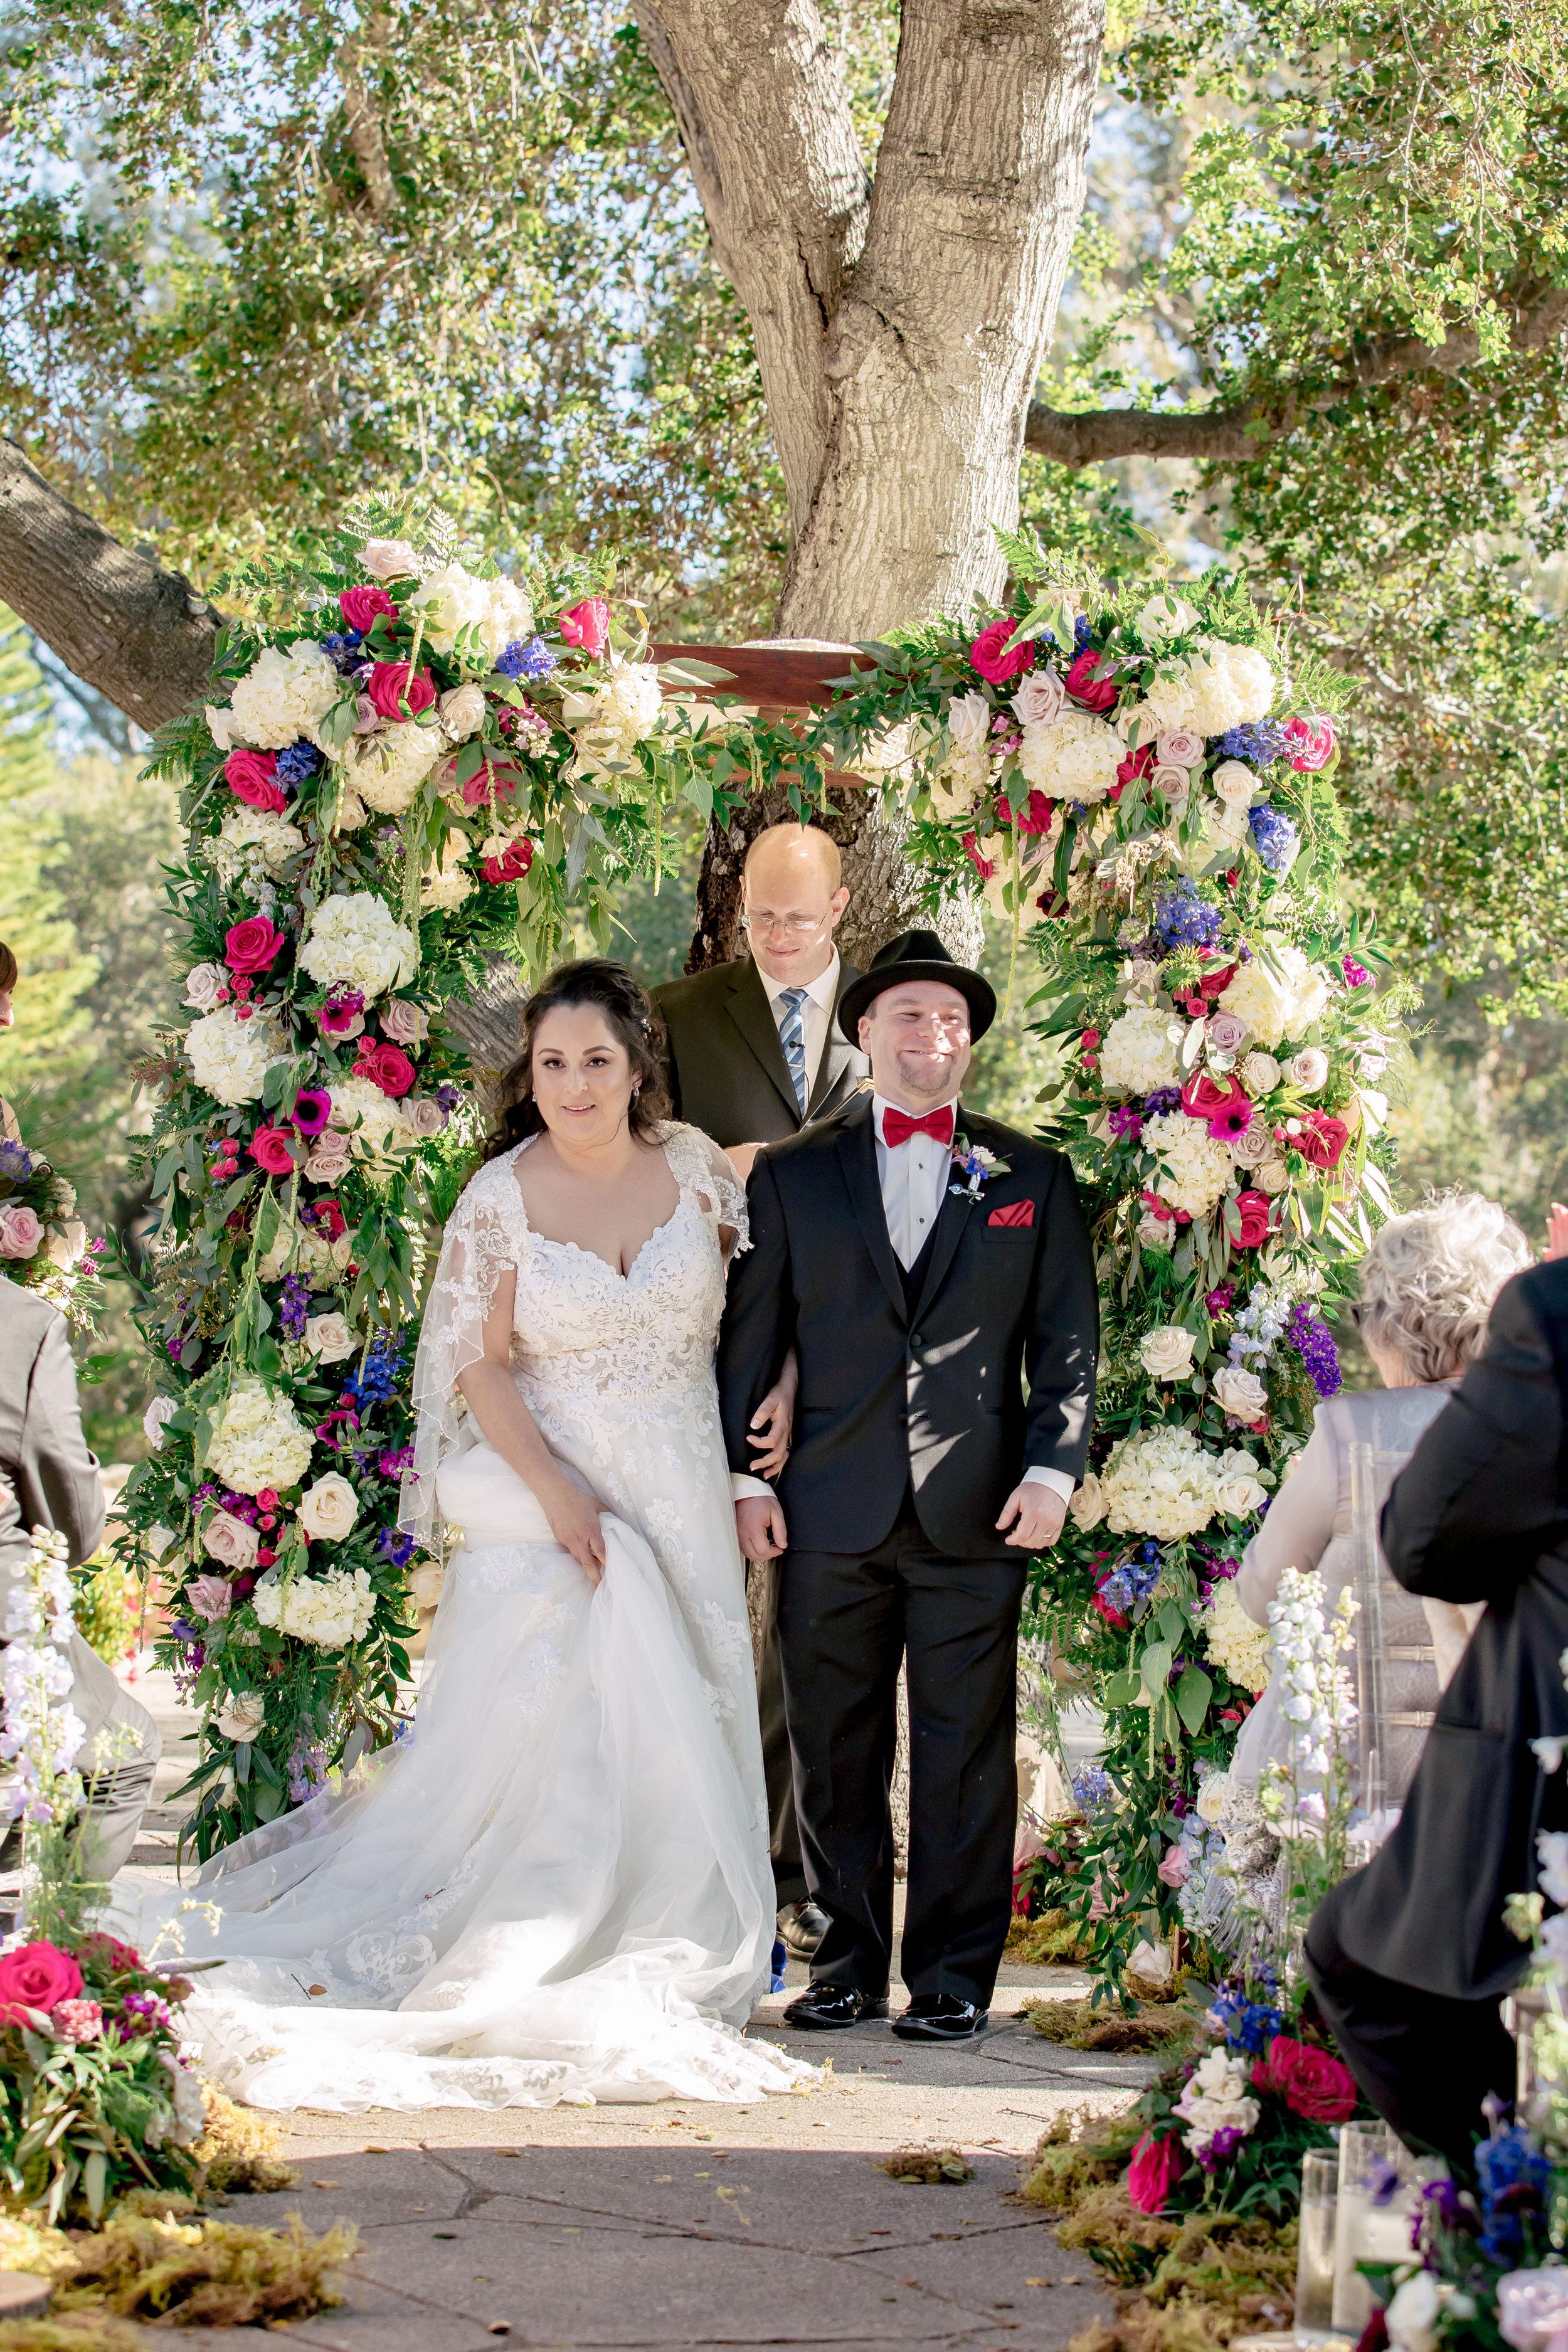 www.santabarbarawedding.com | Rewind Photography | Rockwood Women's Club | Burlap & Bordeaux | Amigo Party Rental | Couple Exit the Ceremony